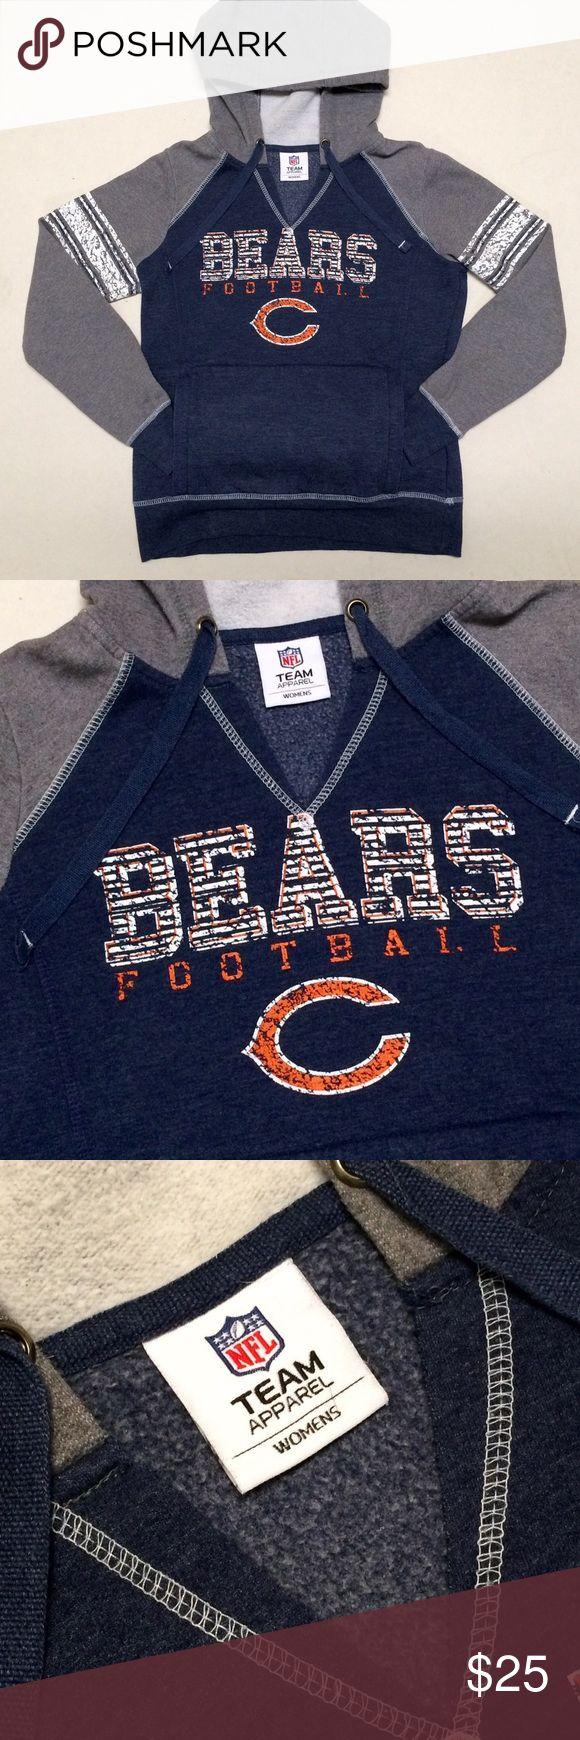 Chicago Bears - NFL Women's V-neck Hoodie  Chicago Bears  Official NFL Team Apparel   Super cute women's v-neck hoodie   Size Women's Small   Da Bears!!  NFL Tops Sweatshirts & Hoodies